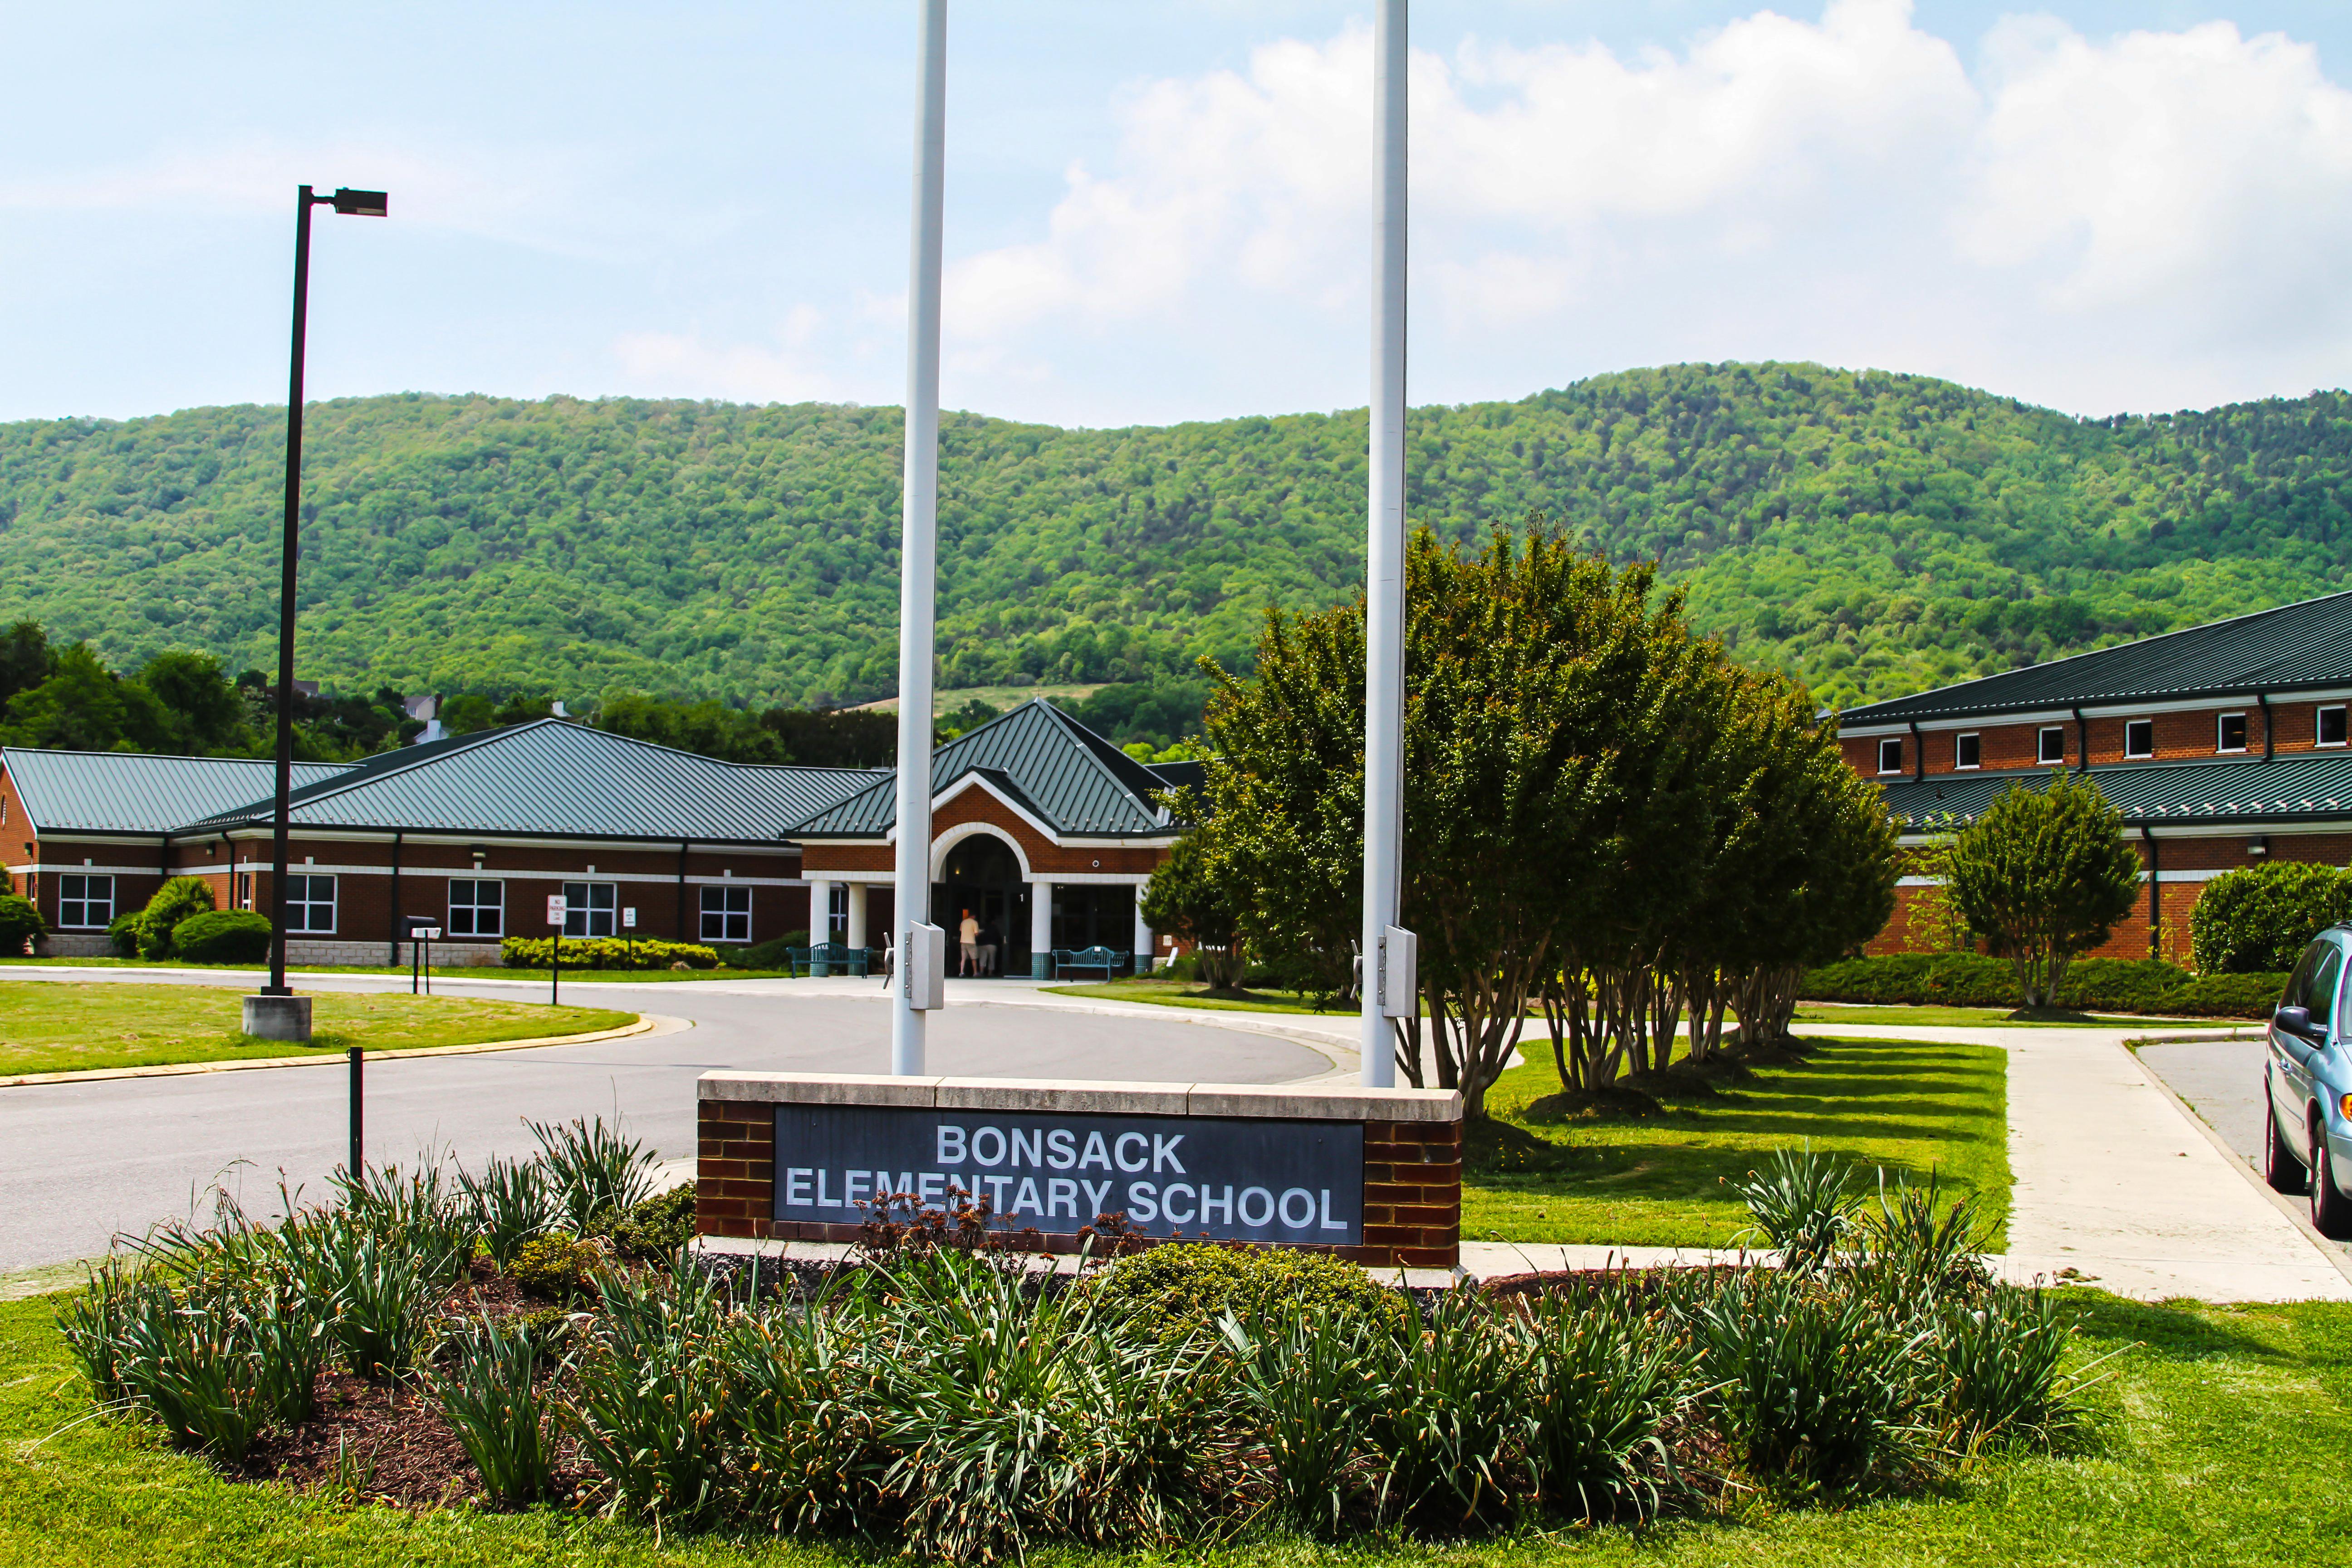 Bonsack Elementary